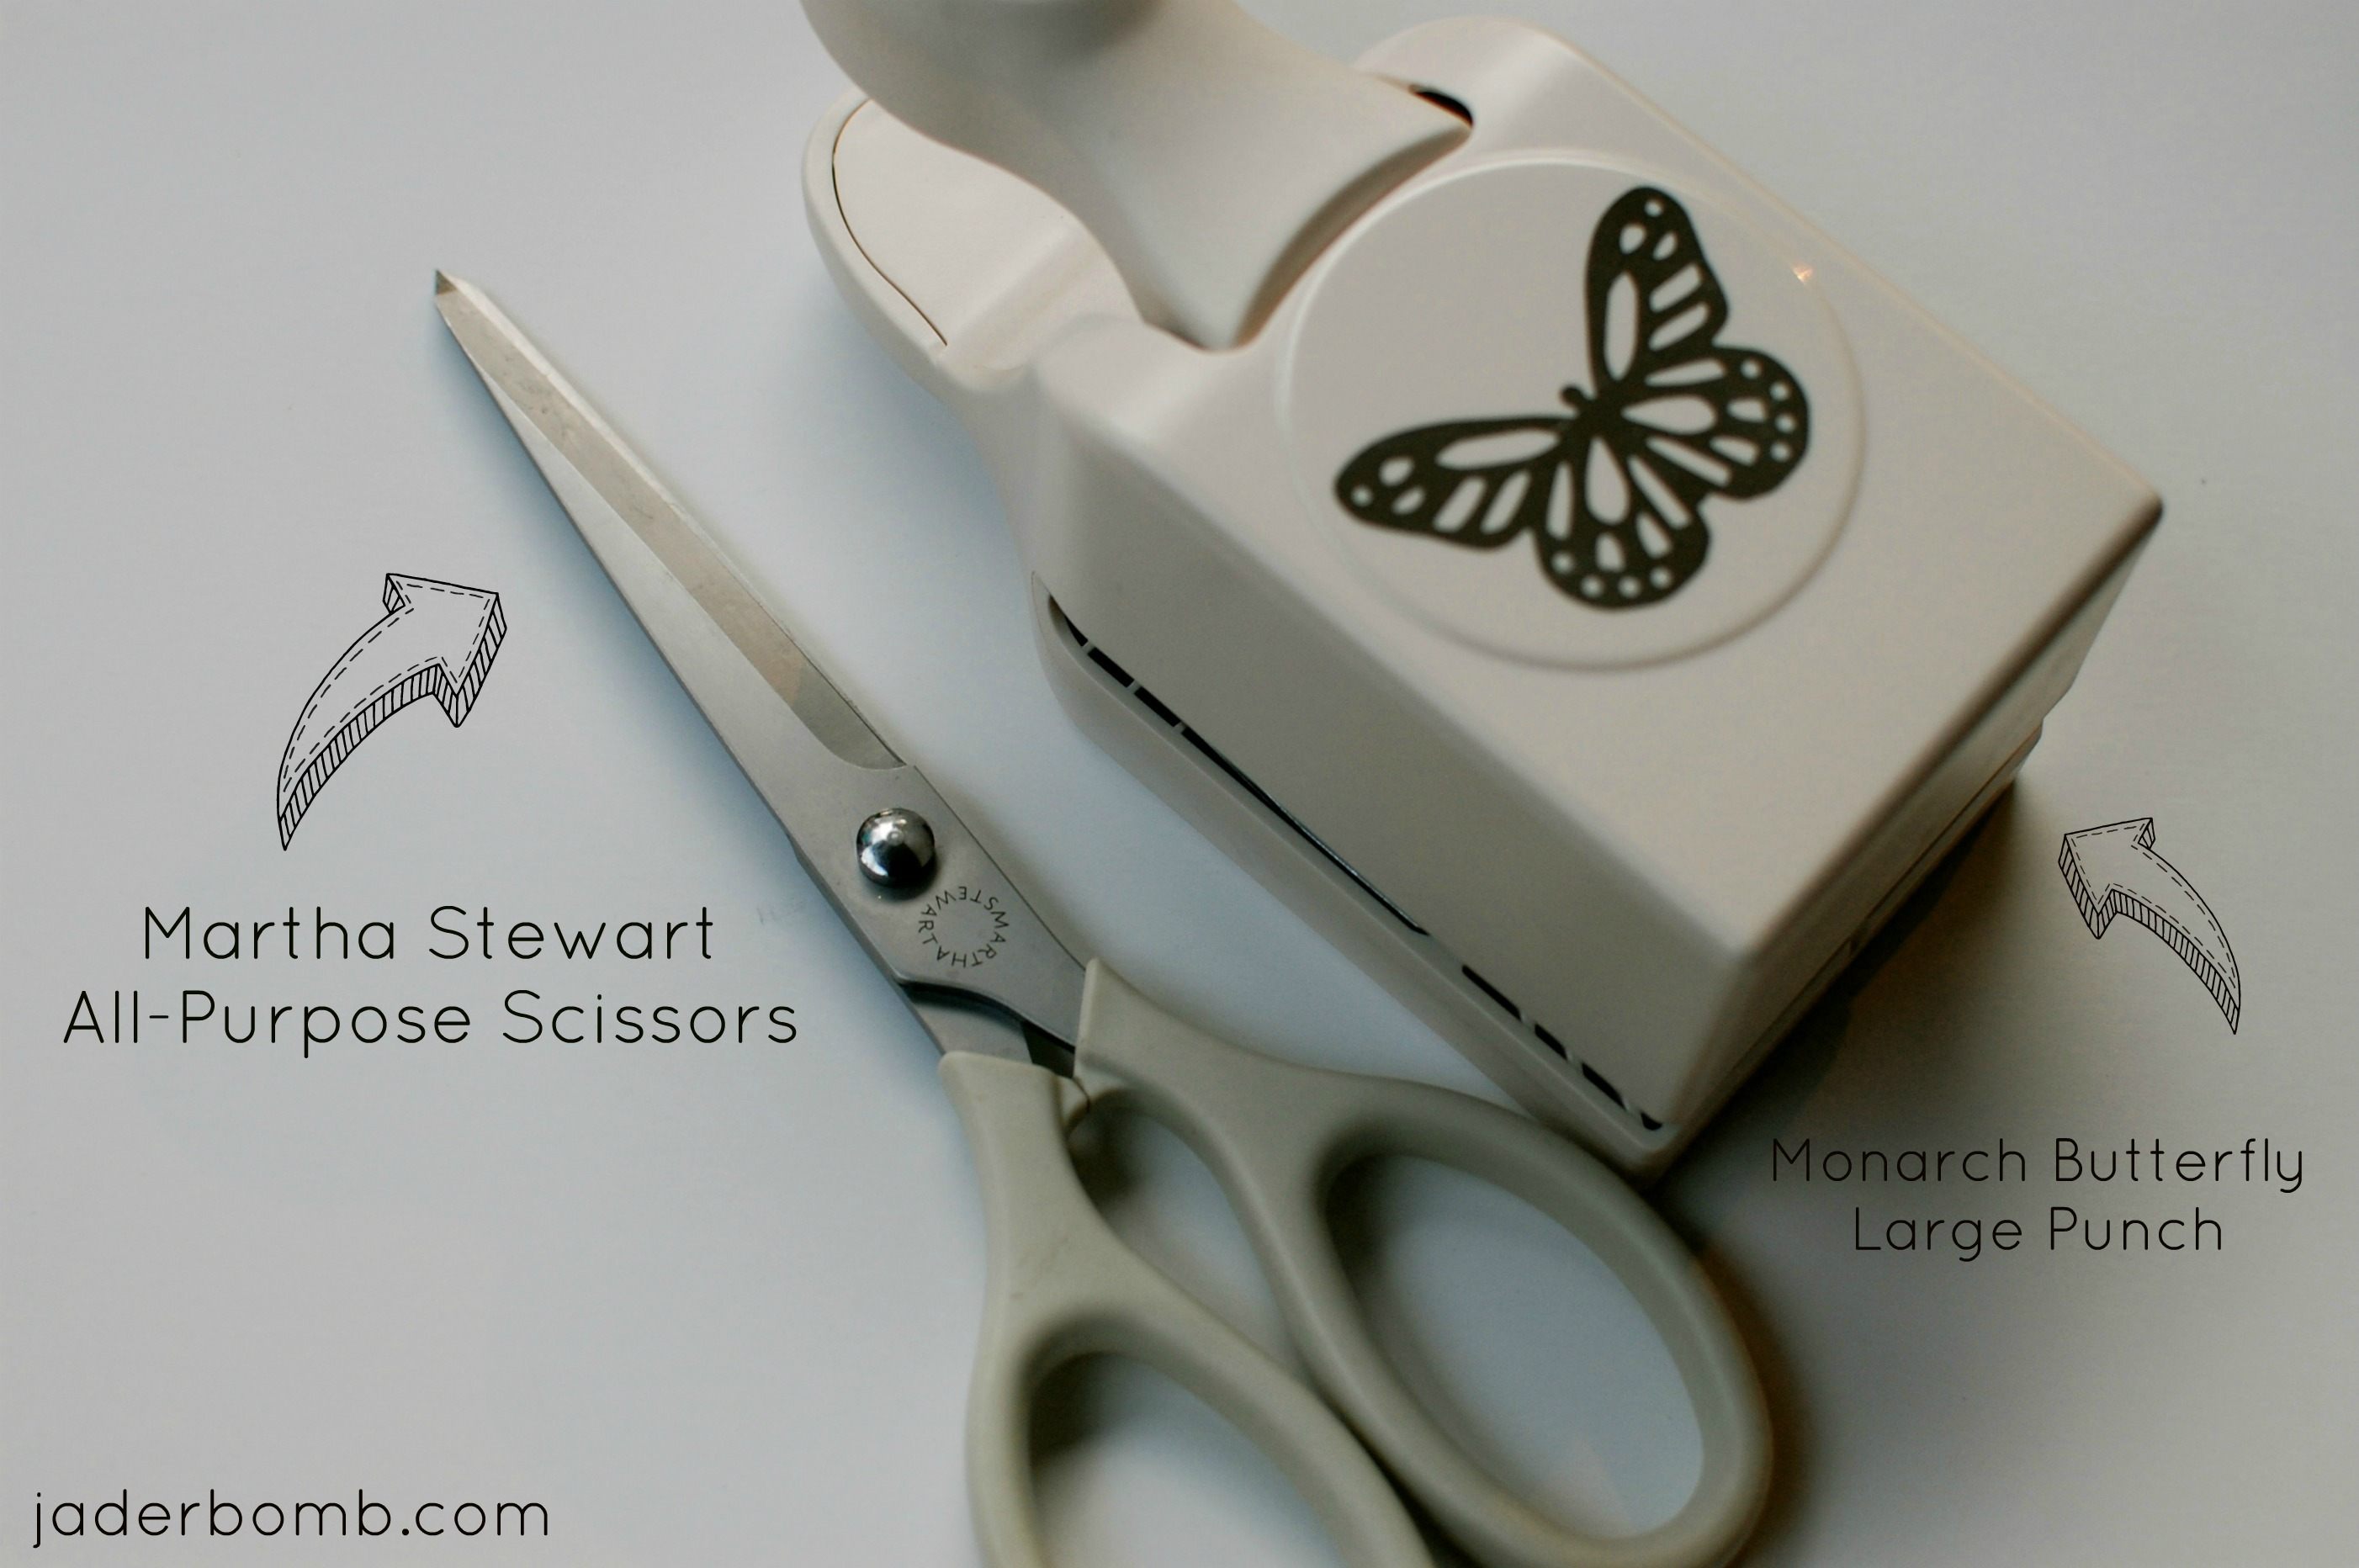 all purpose scissors Archives - JADERBOMB